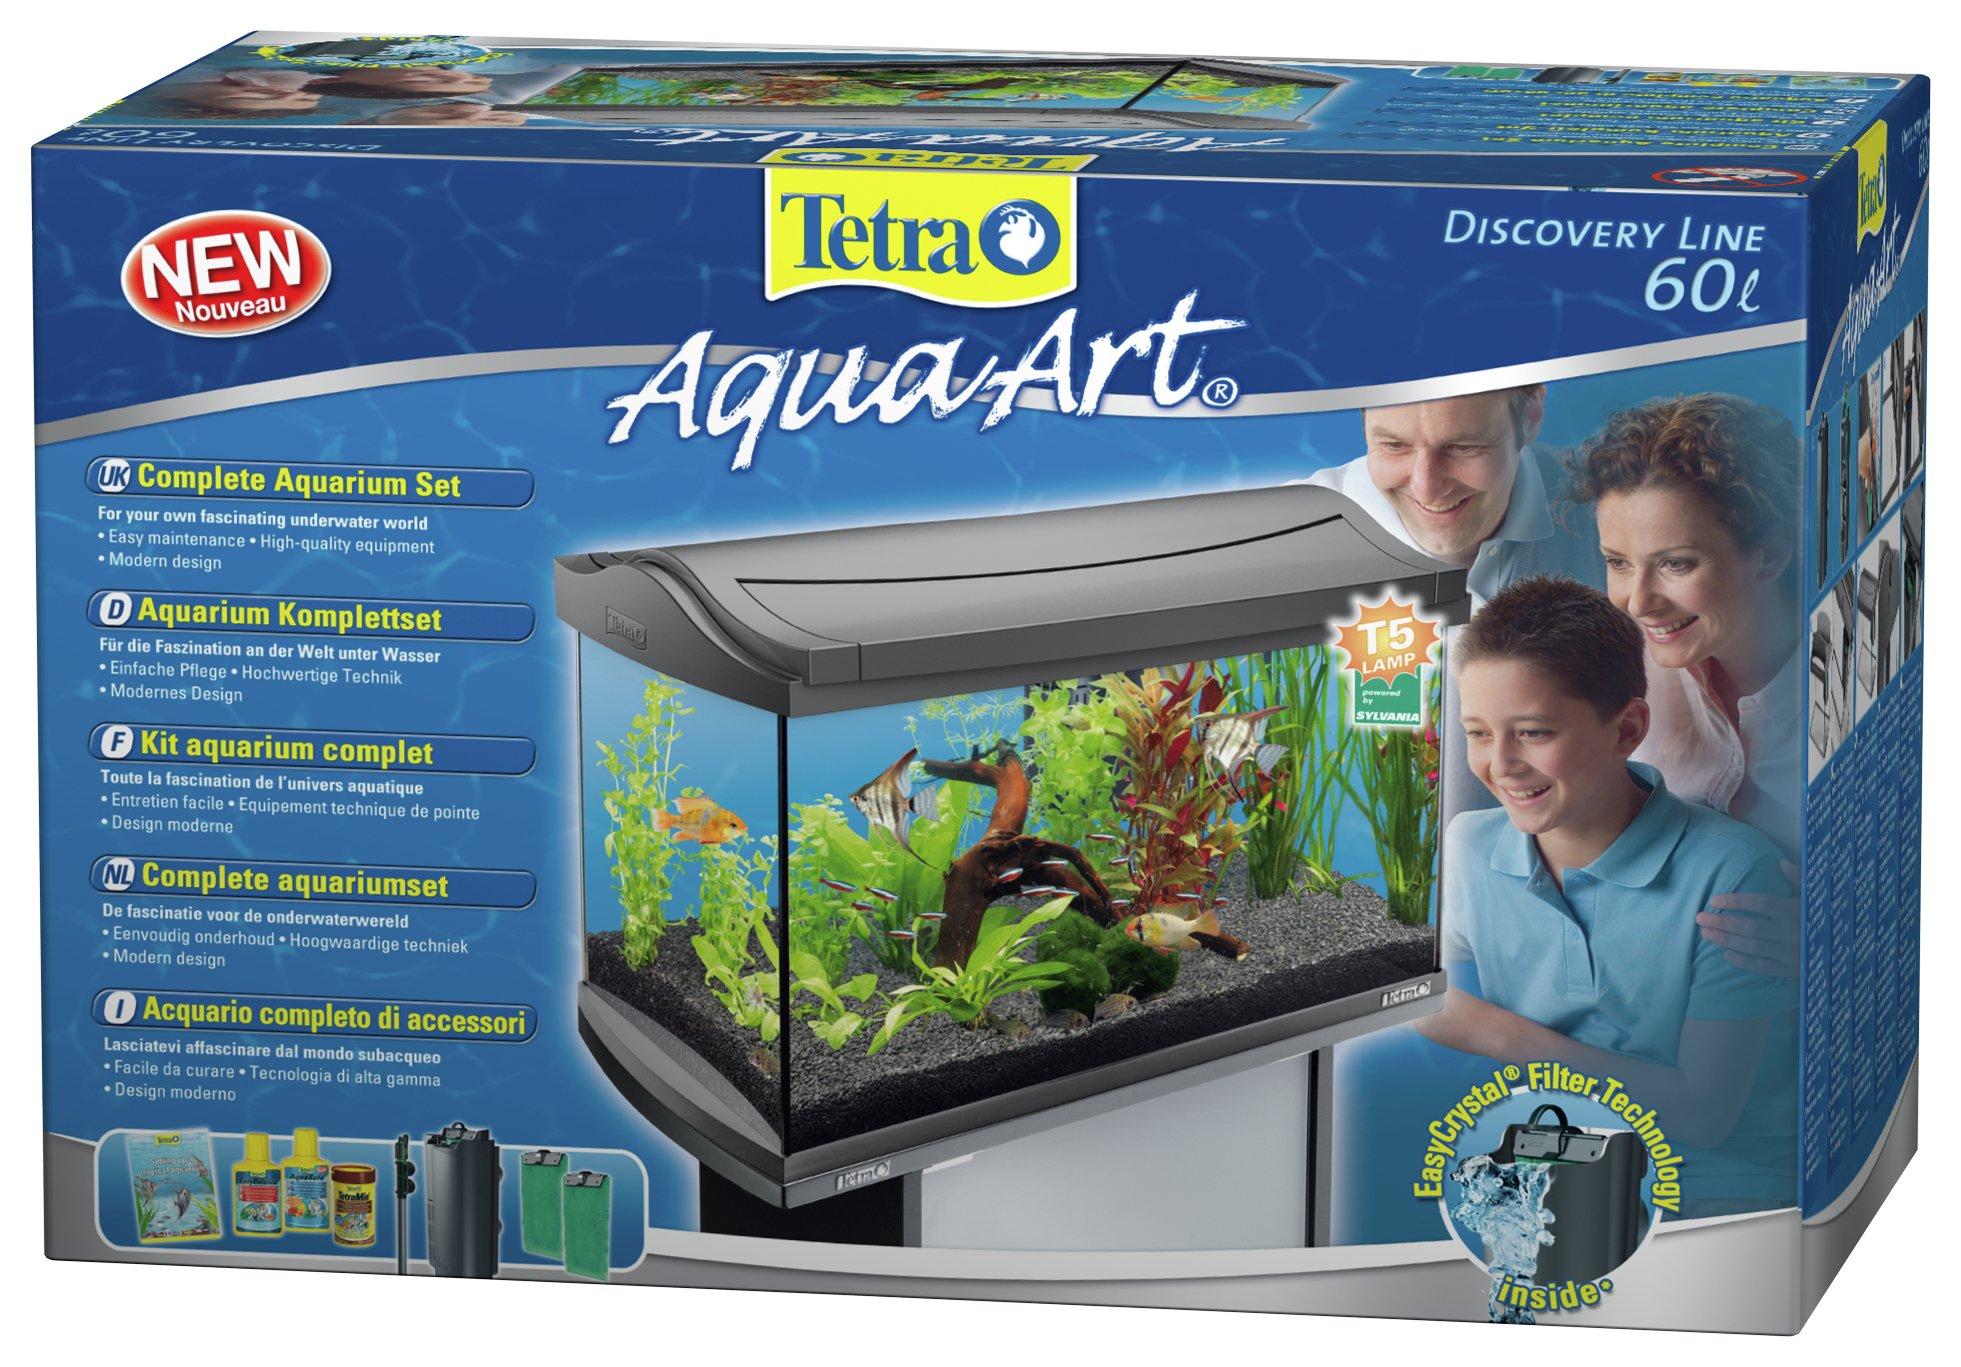 Tetra aquaart ii 60 litre aquarium graphite for Decoration aquarium 60 litres